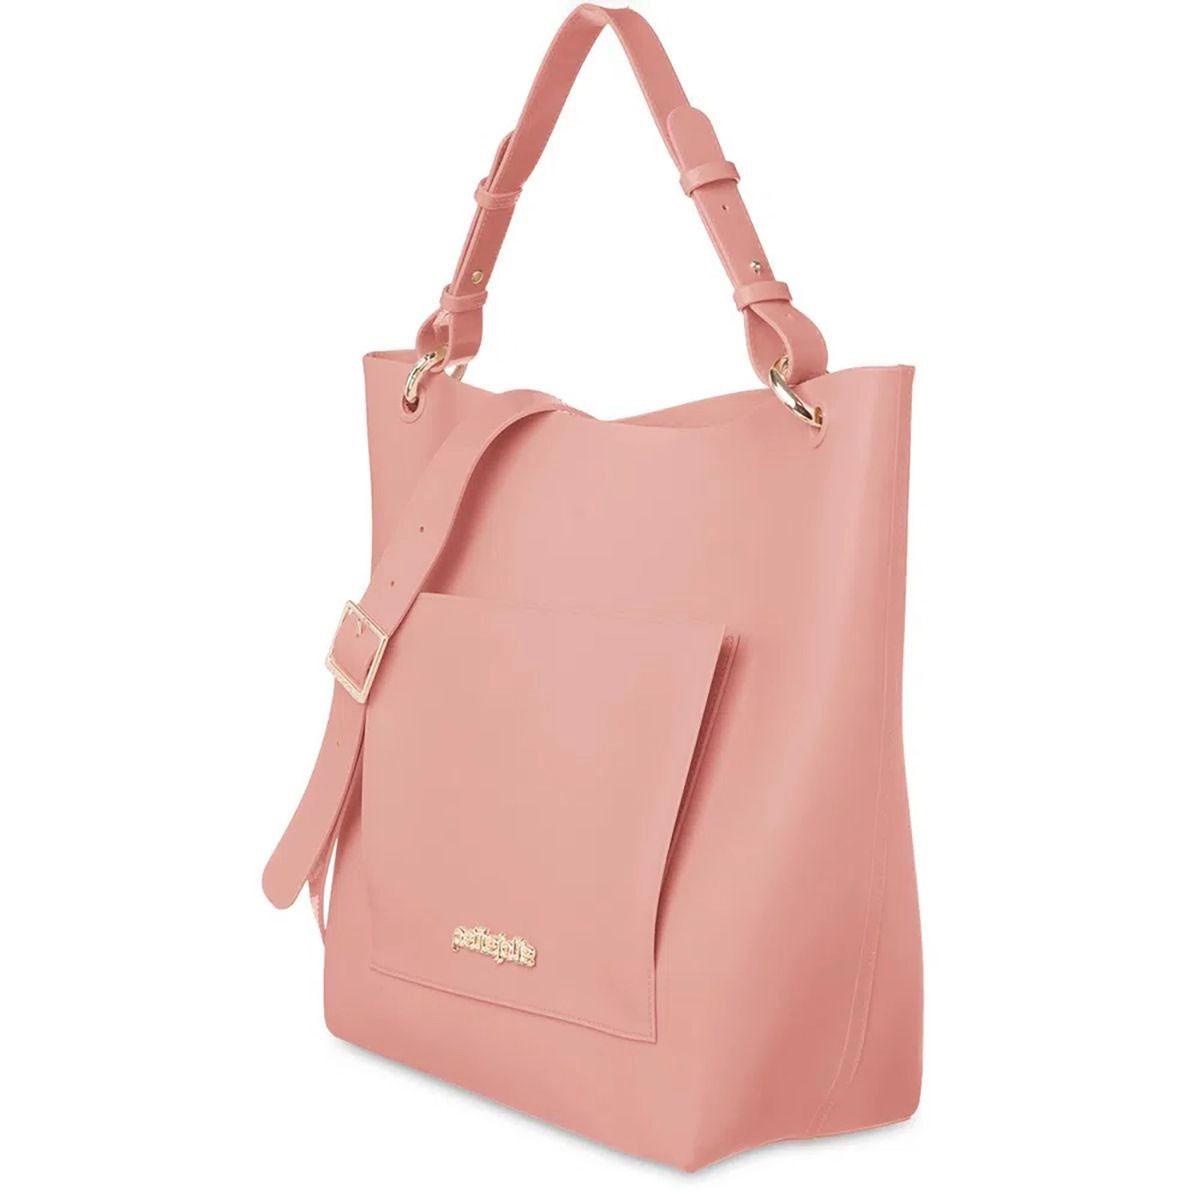 Bolsa City Bag Petite Jolie PJ5012 - Záten